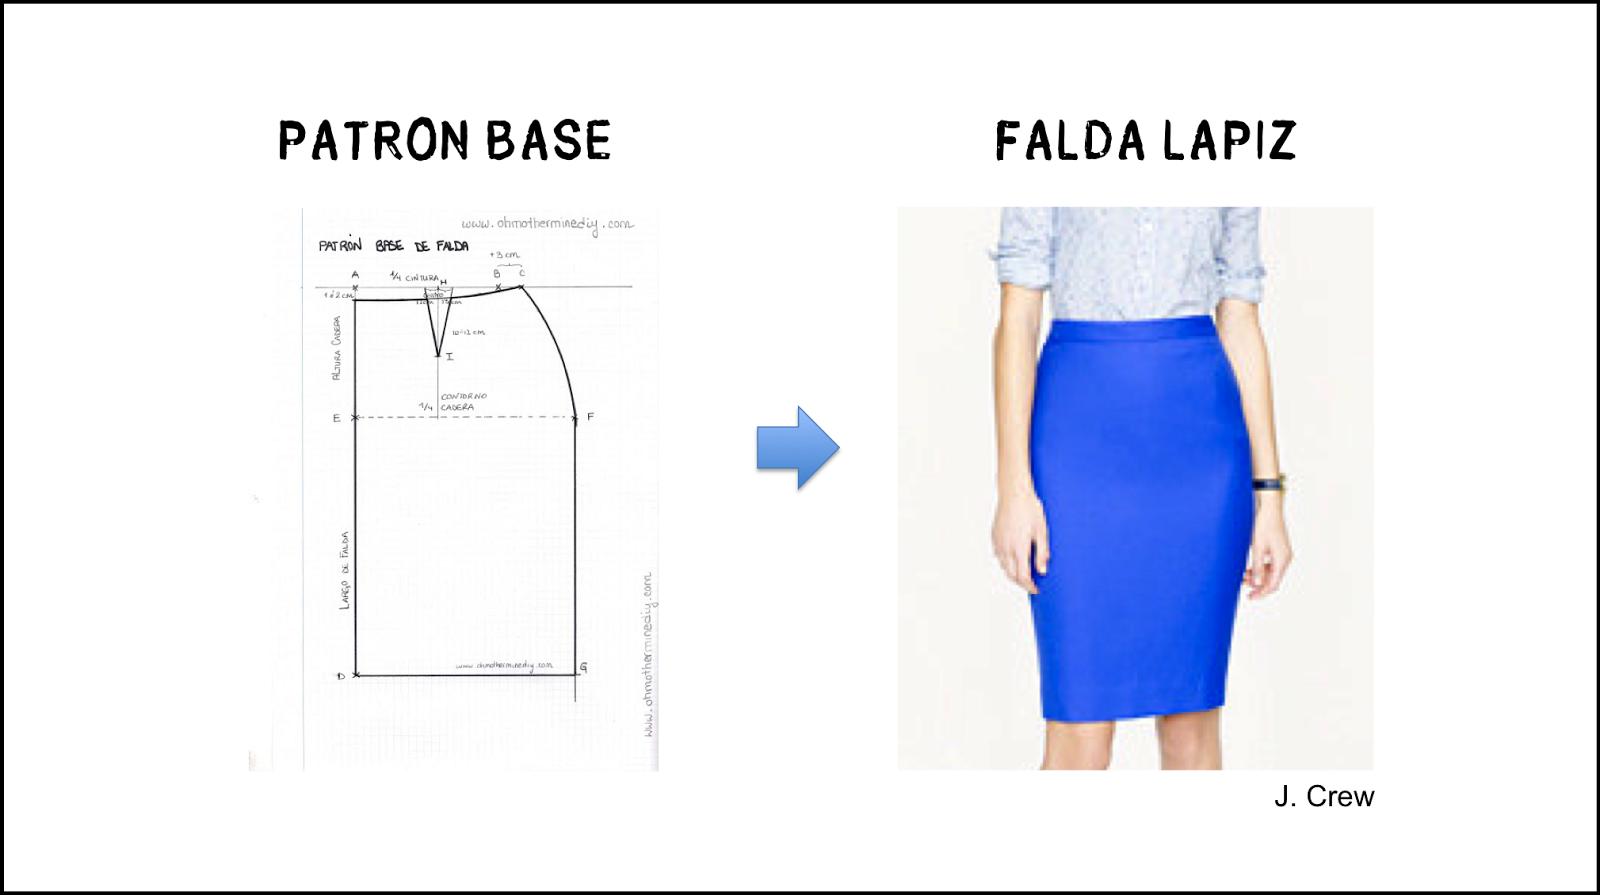 180d0e56d Aprender a coser faldas parte 2: Modificar el patrón para hacer ...